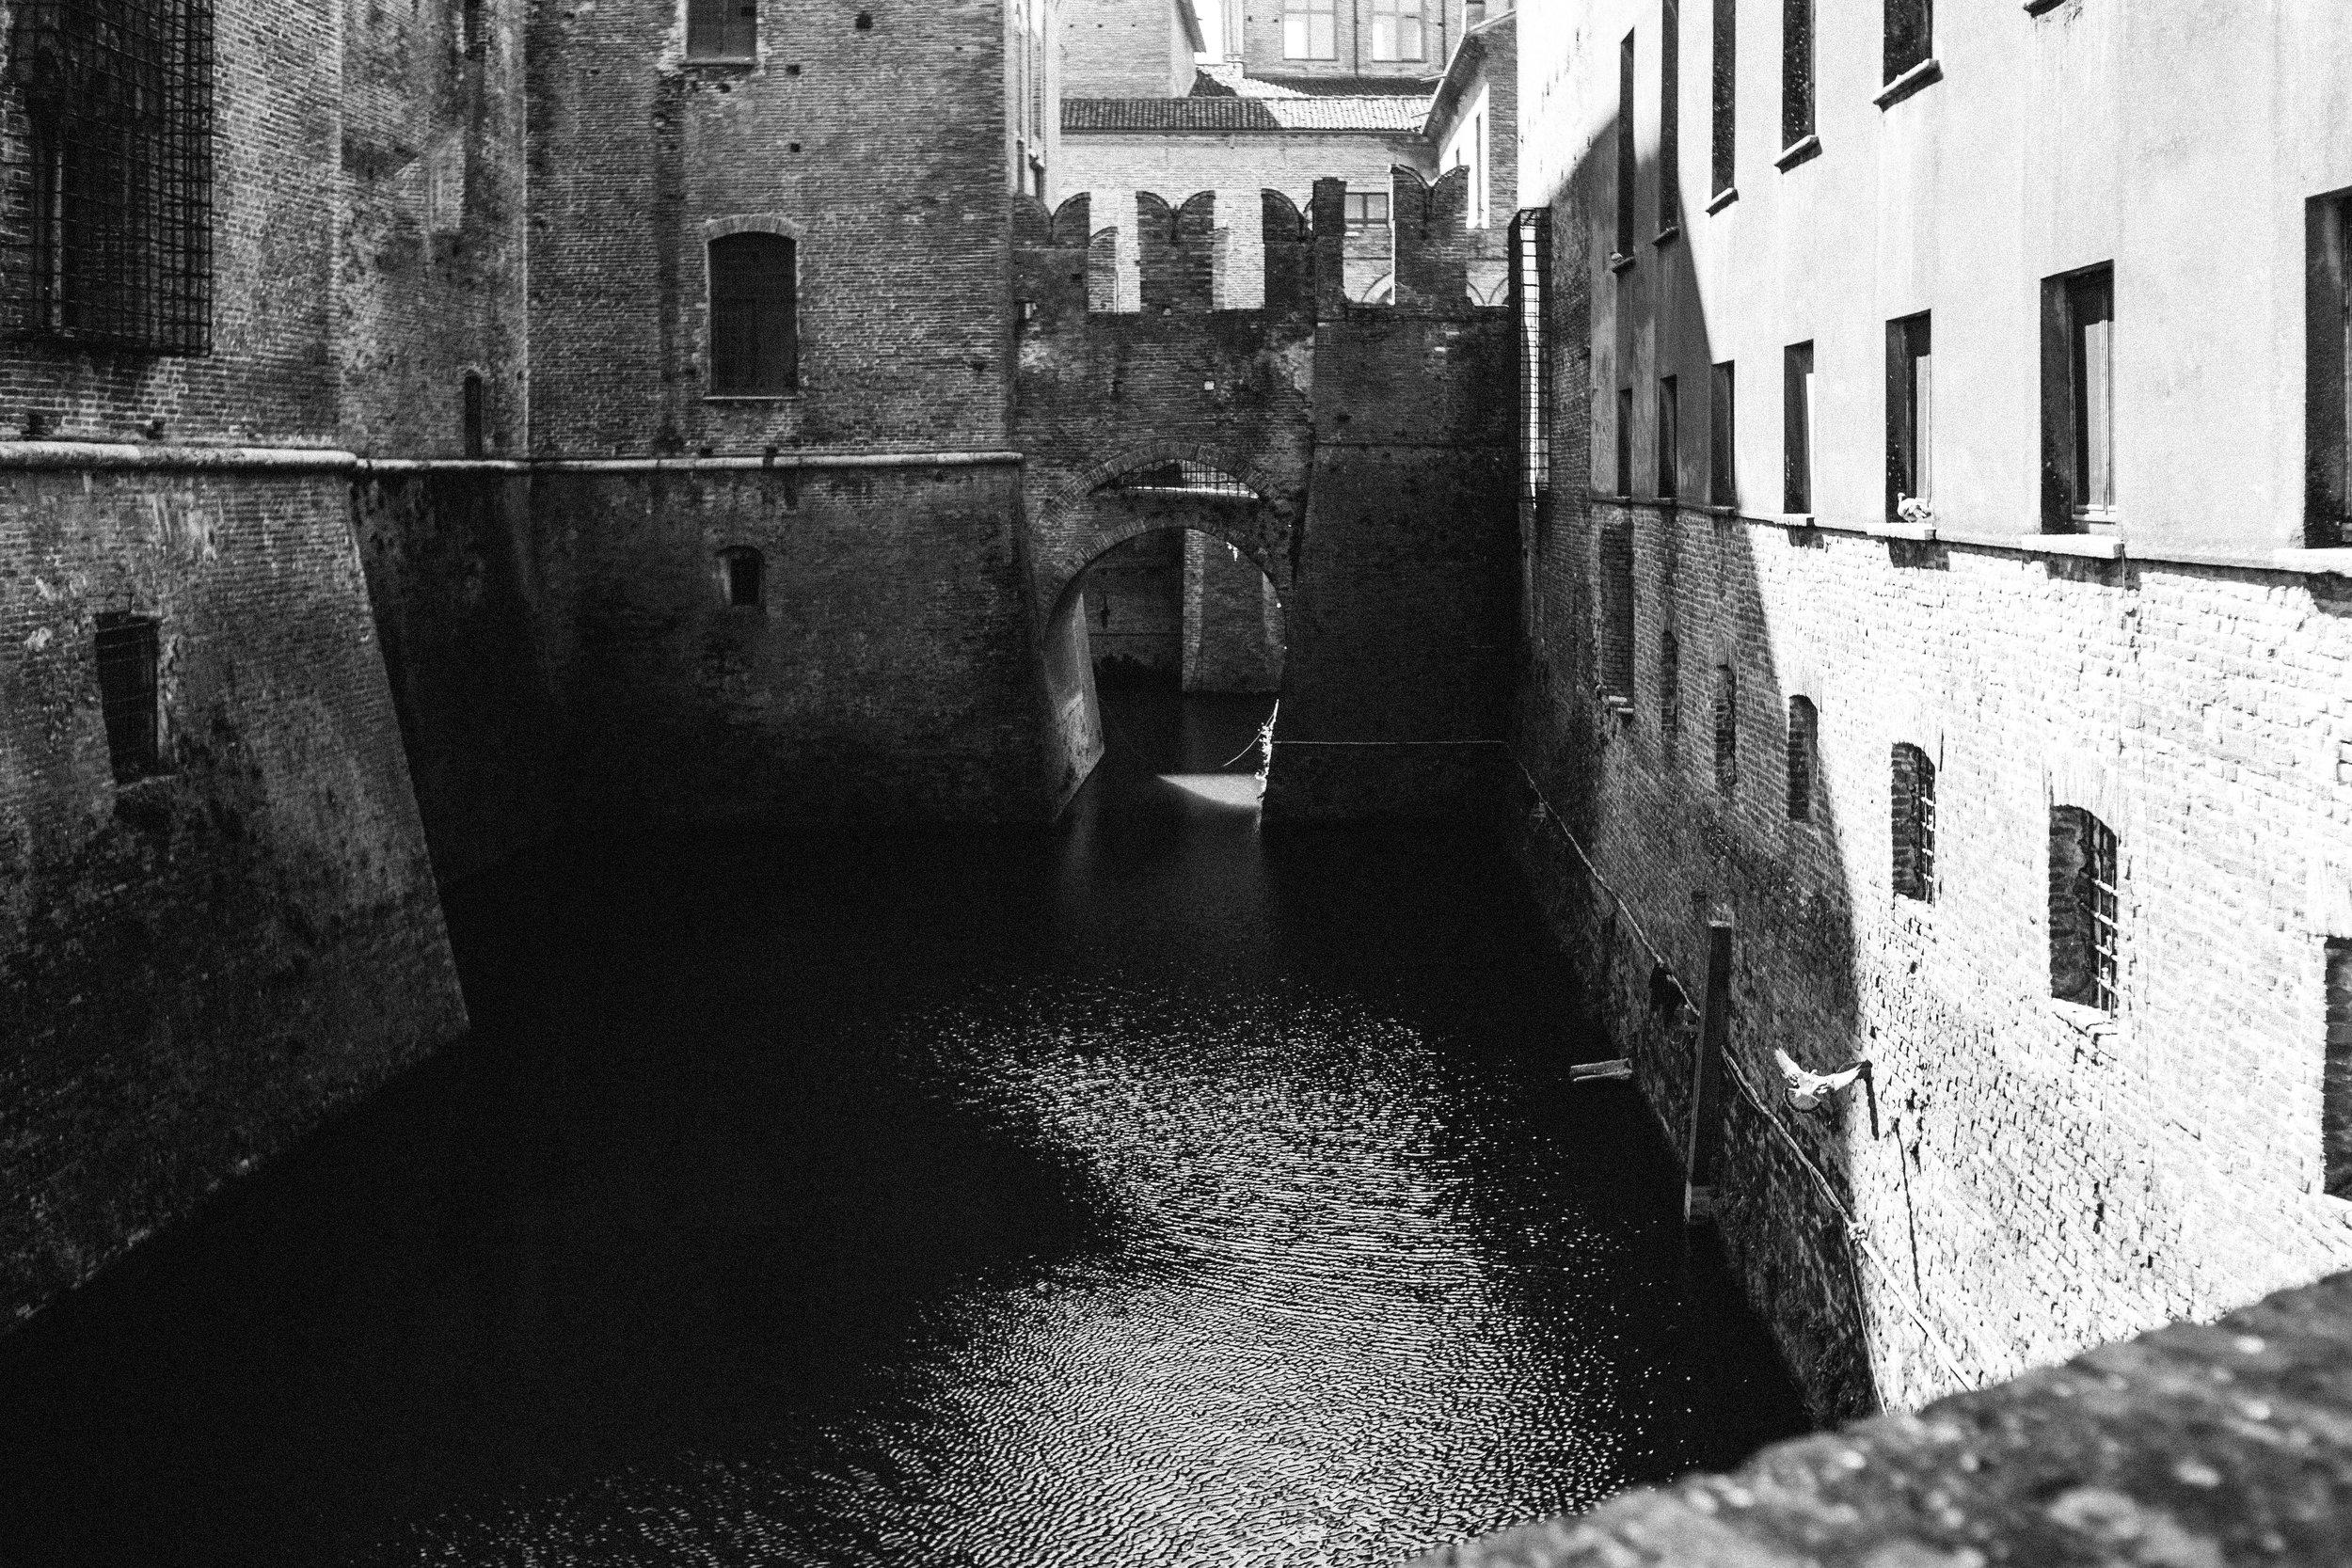 020 - Mantova.jpg